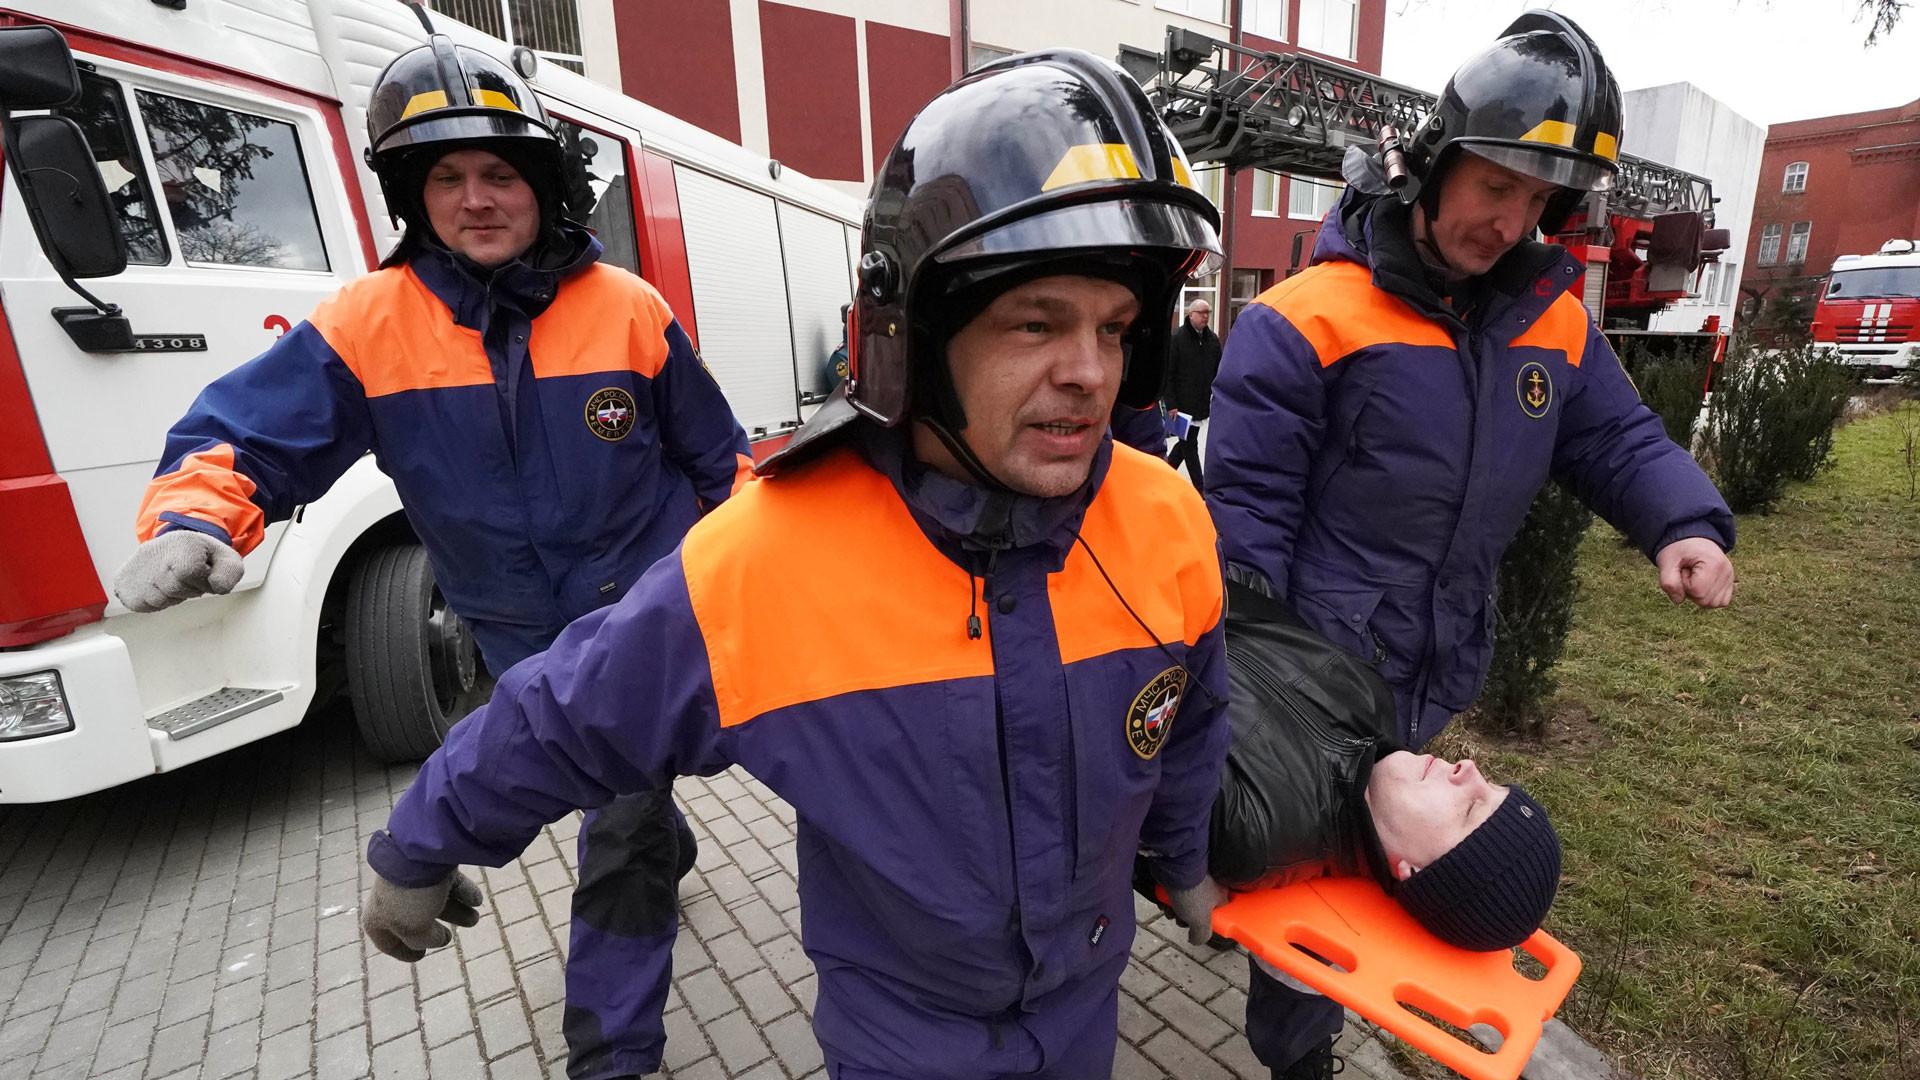 <p>Фото: &copy;&nbsp;РИА Новости/Игорь Зарембо</p>